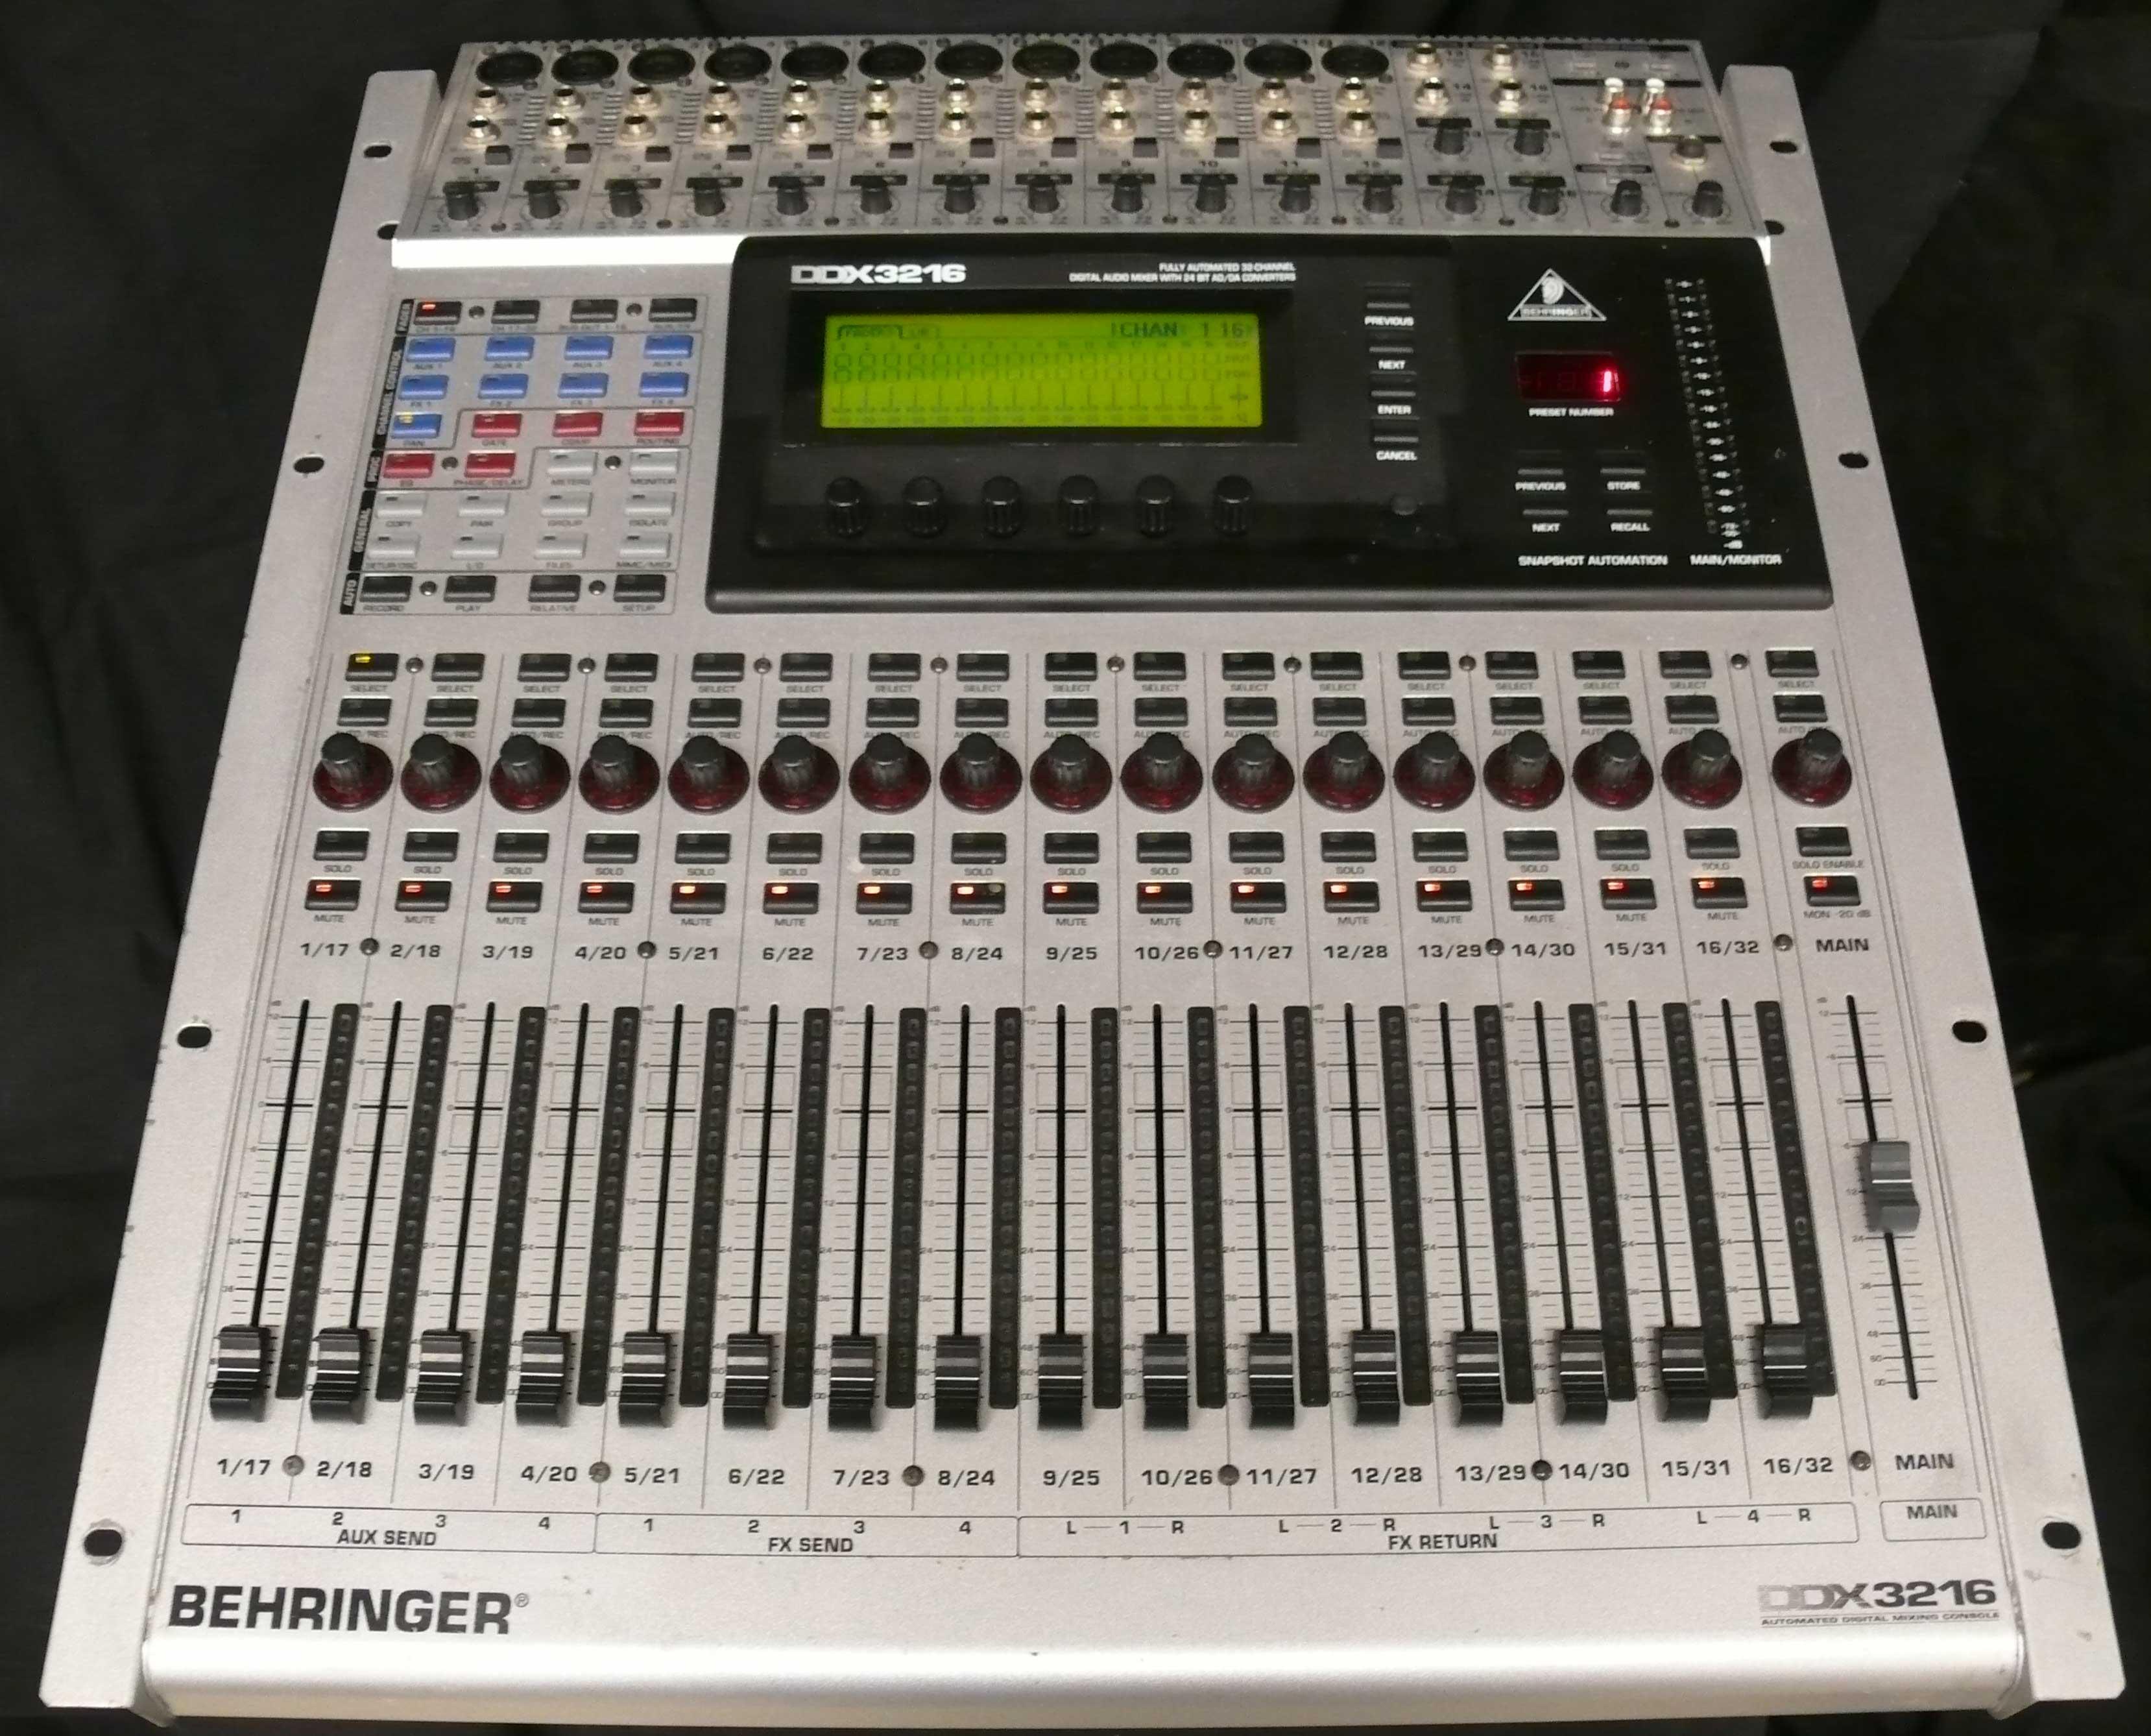 Photo behringer ddx3216 behringer digital mixer series ddx3216 345799 audiofanzine - Console numerique behringer ...